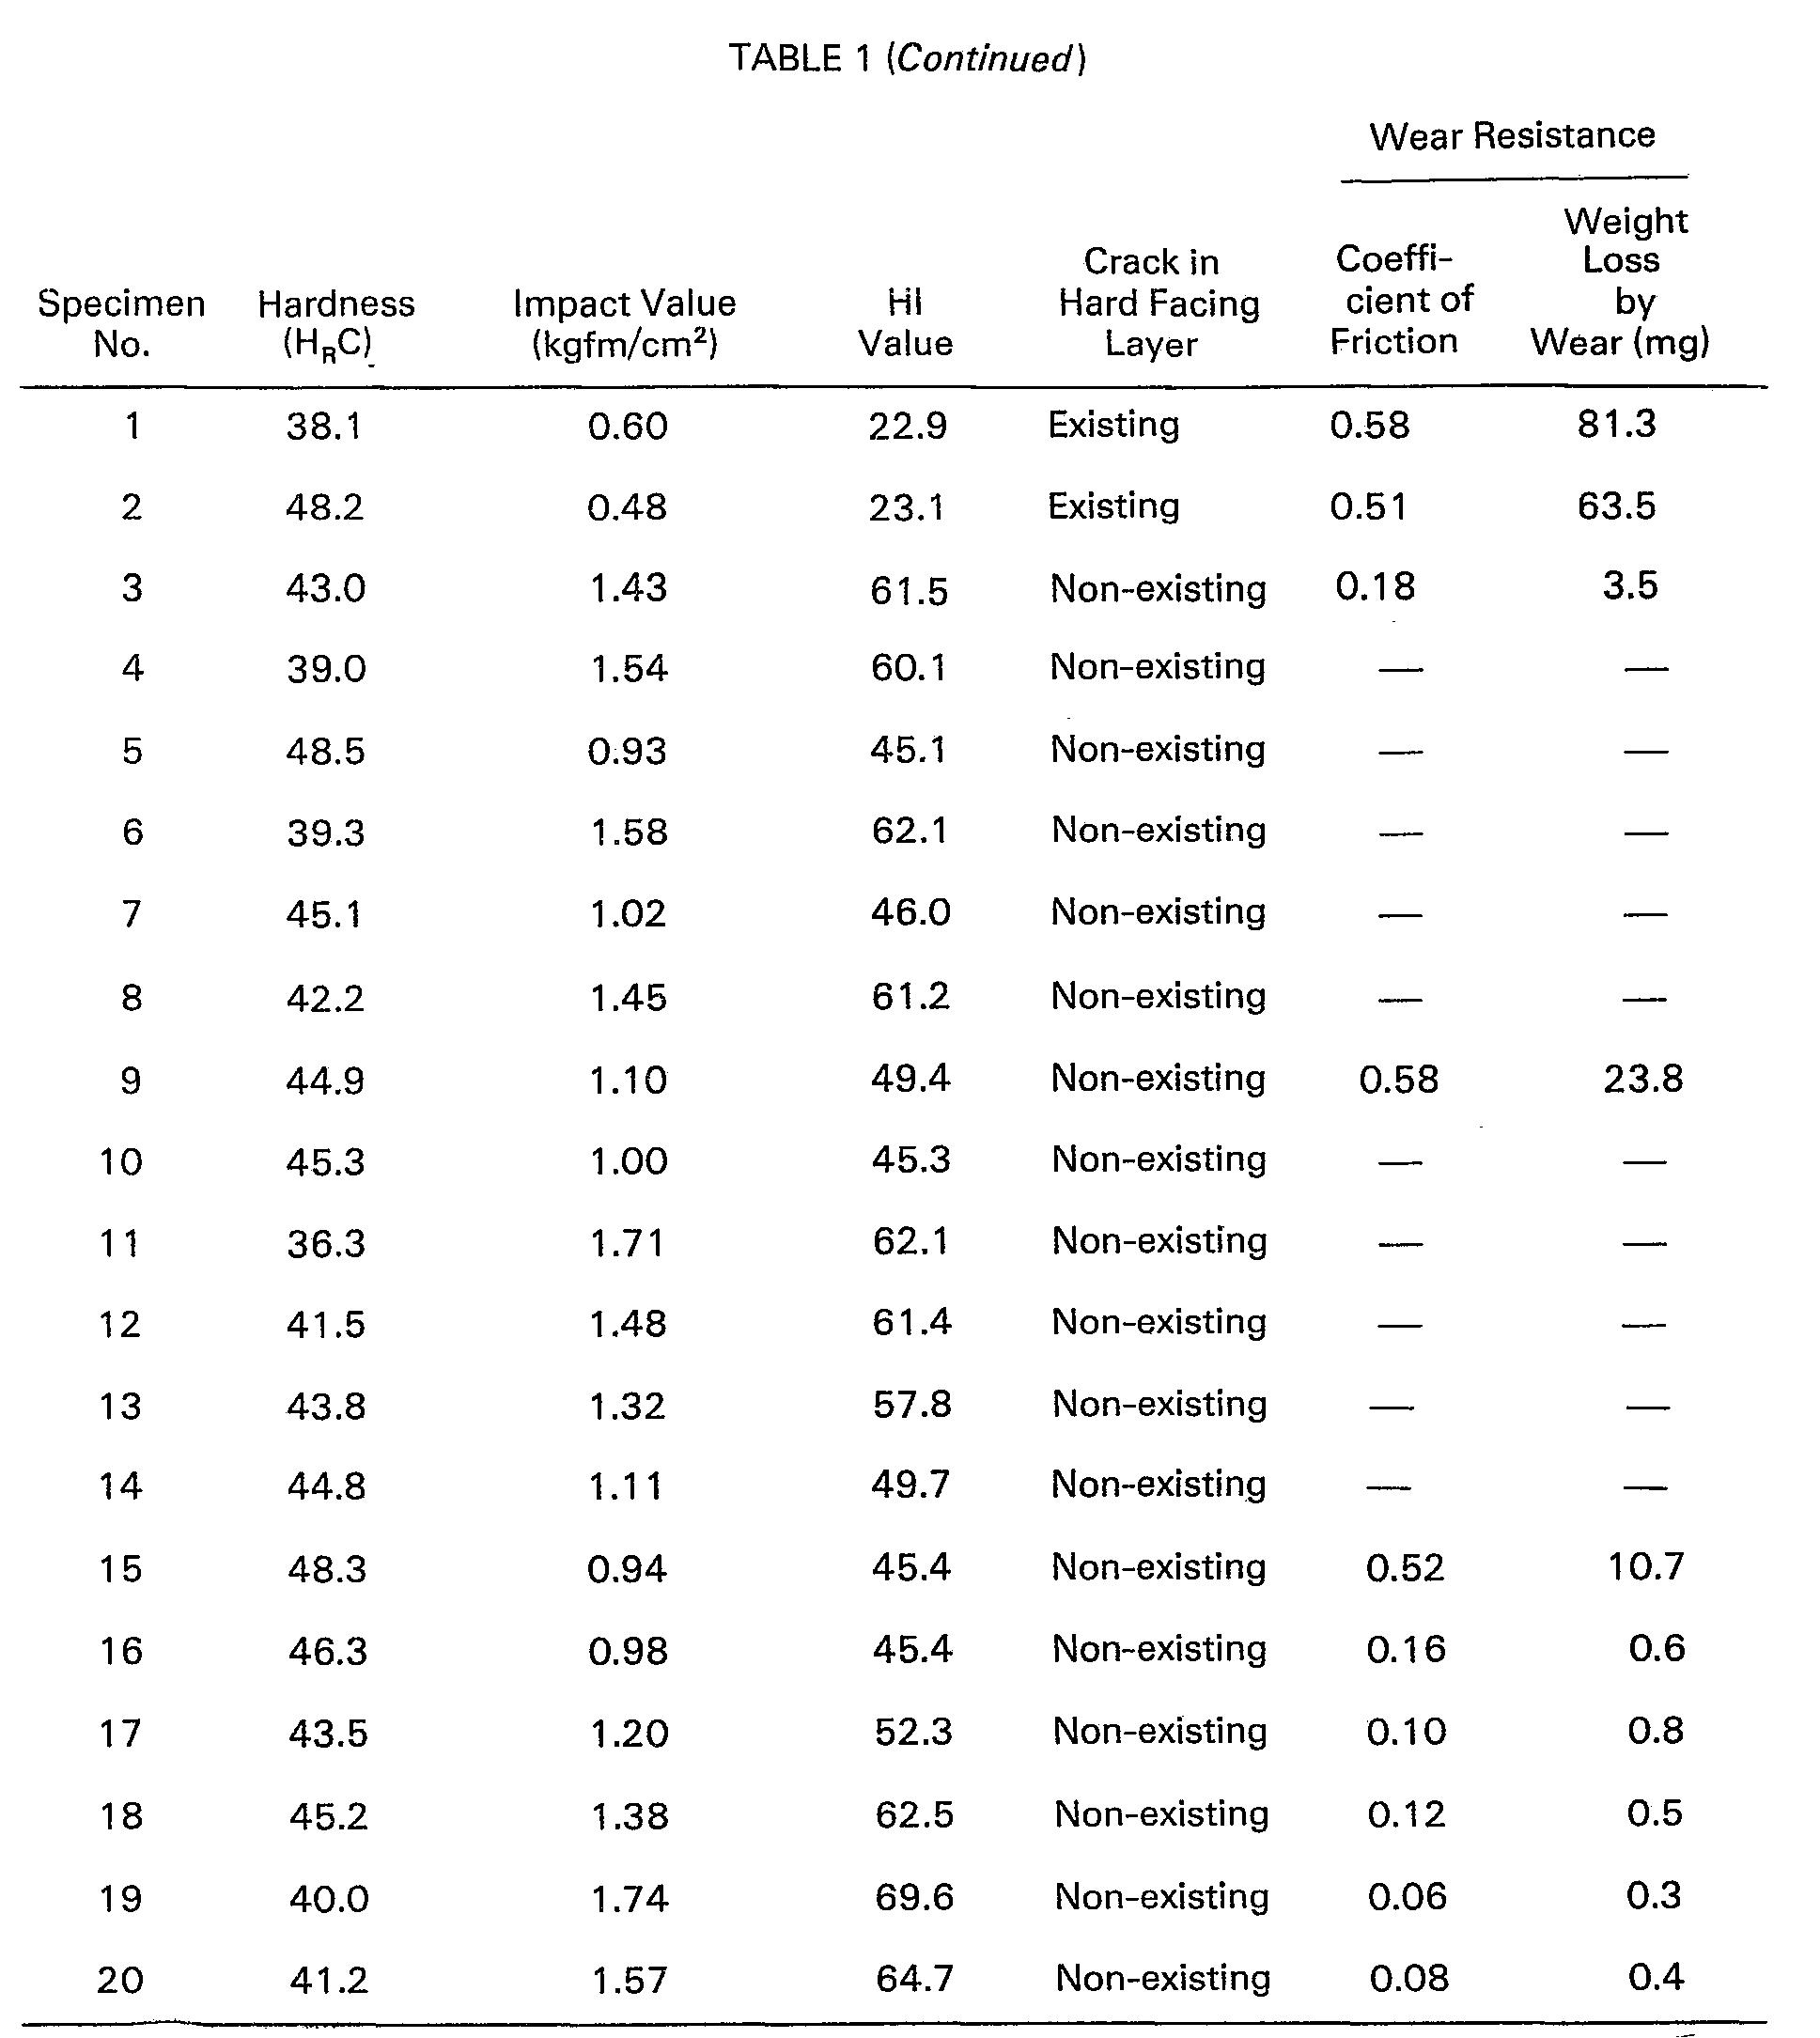 EP0011649B1 - Padding alloys based on nickel - Google Patents